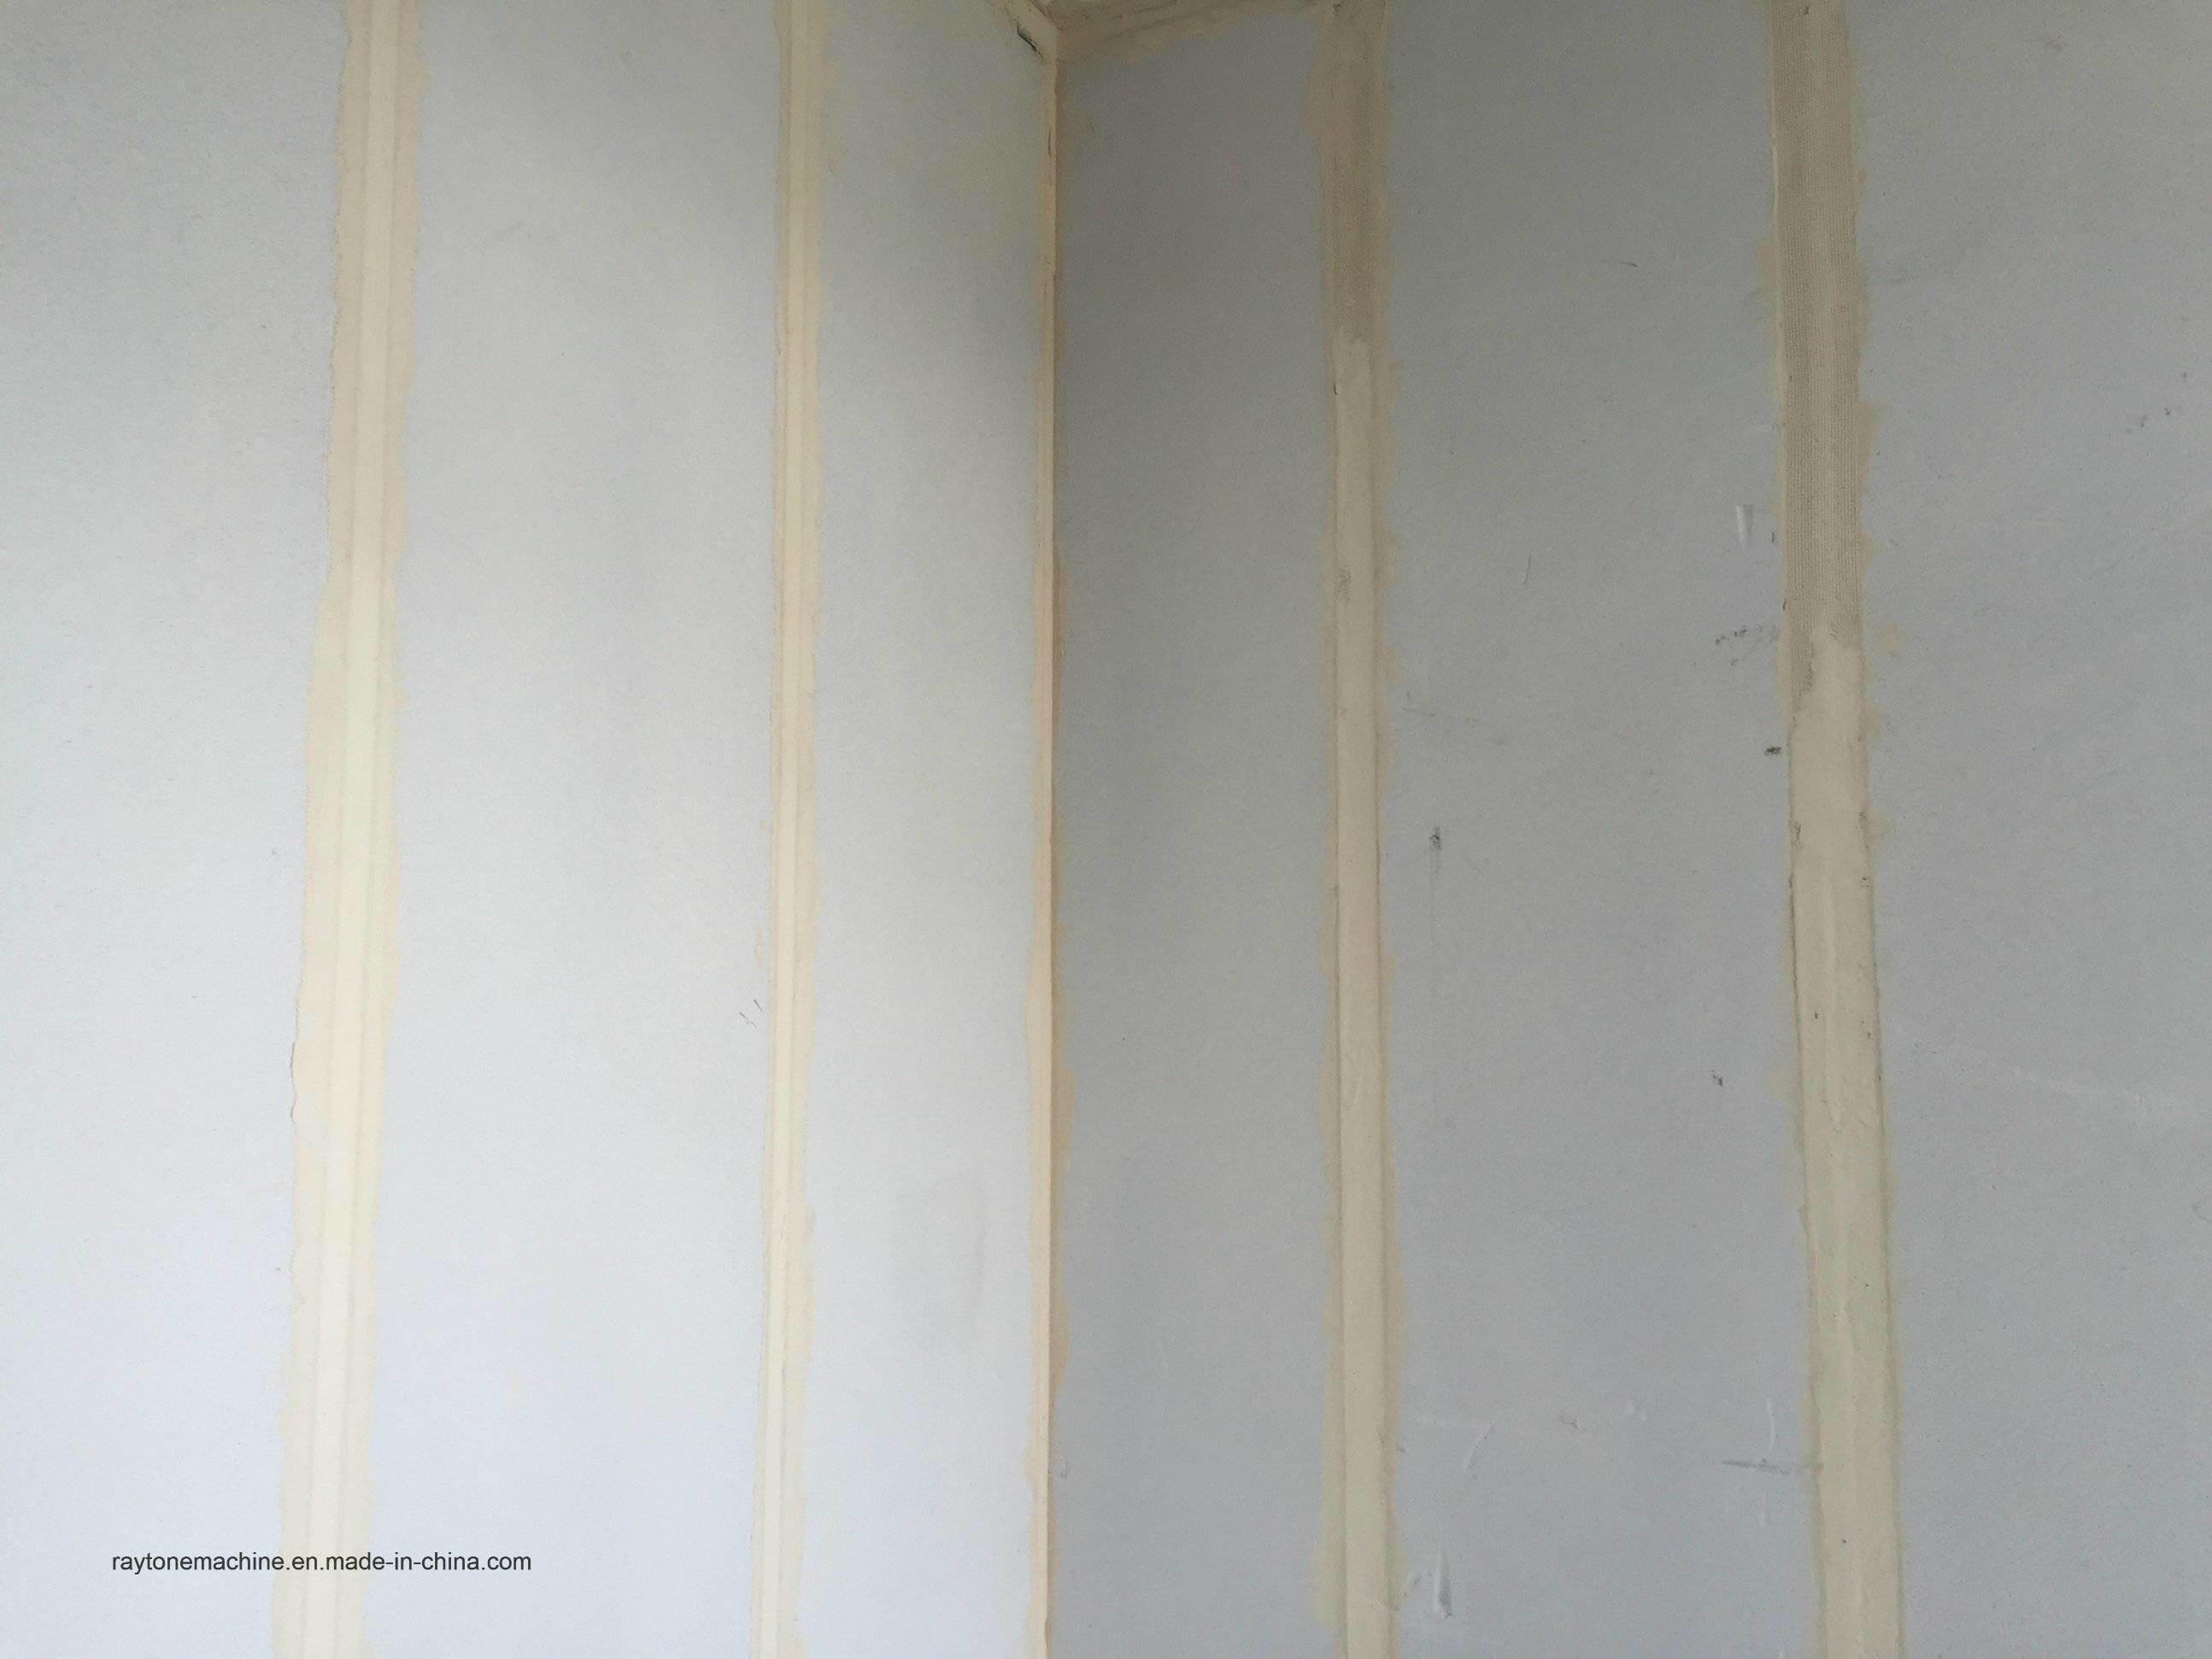 Lightweight Exterior Interior Wall Panel AAC Panel Alc Panel